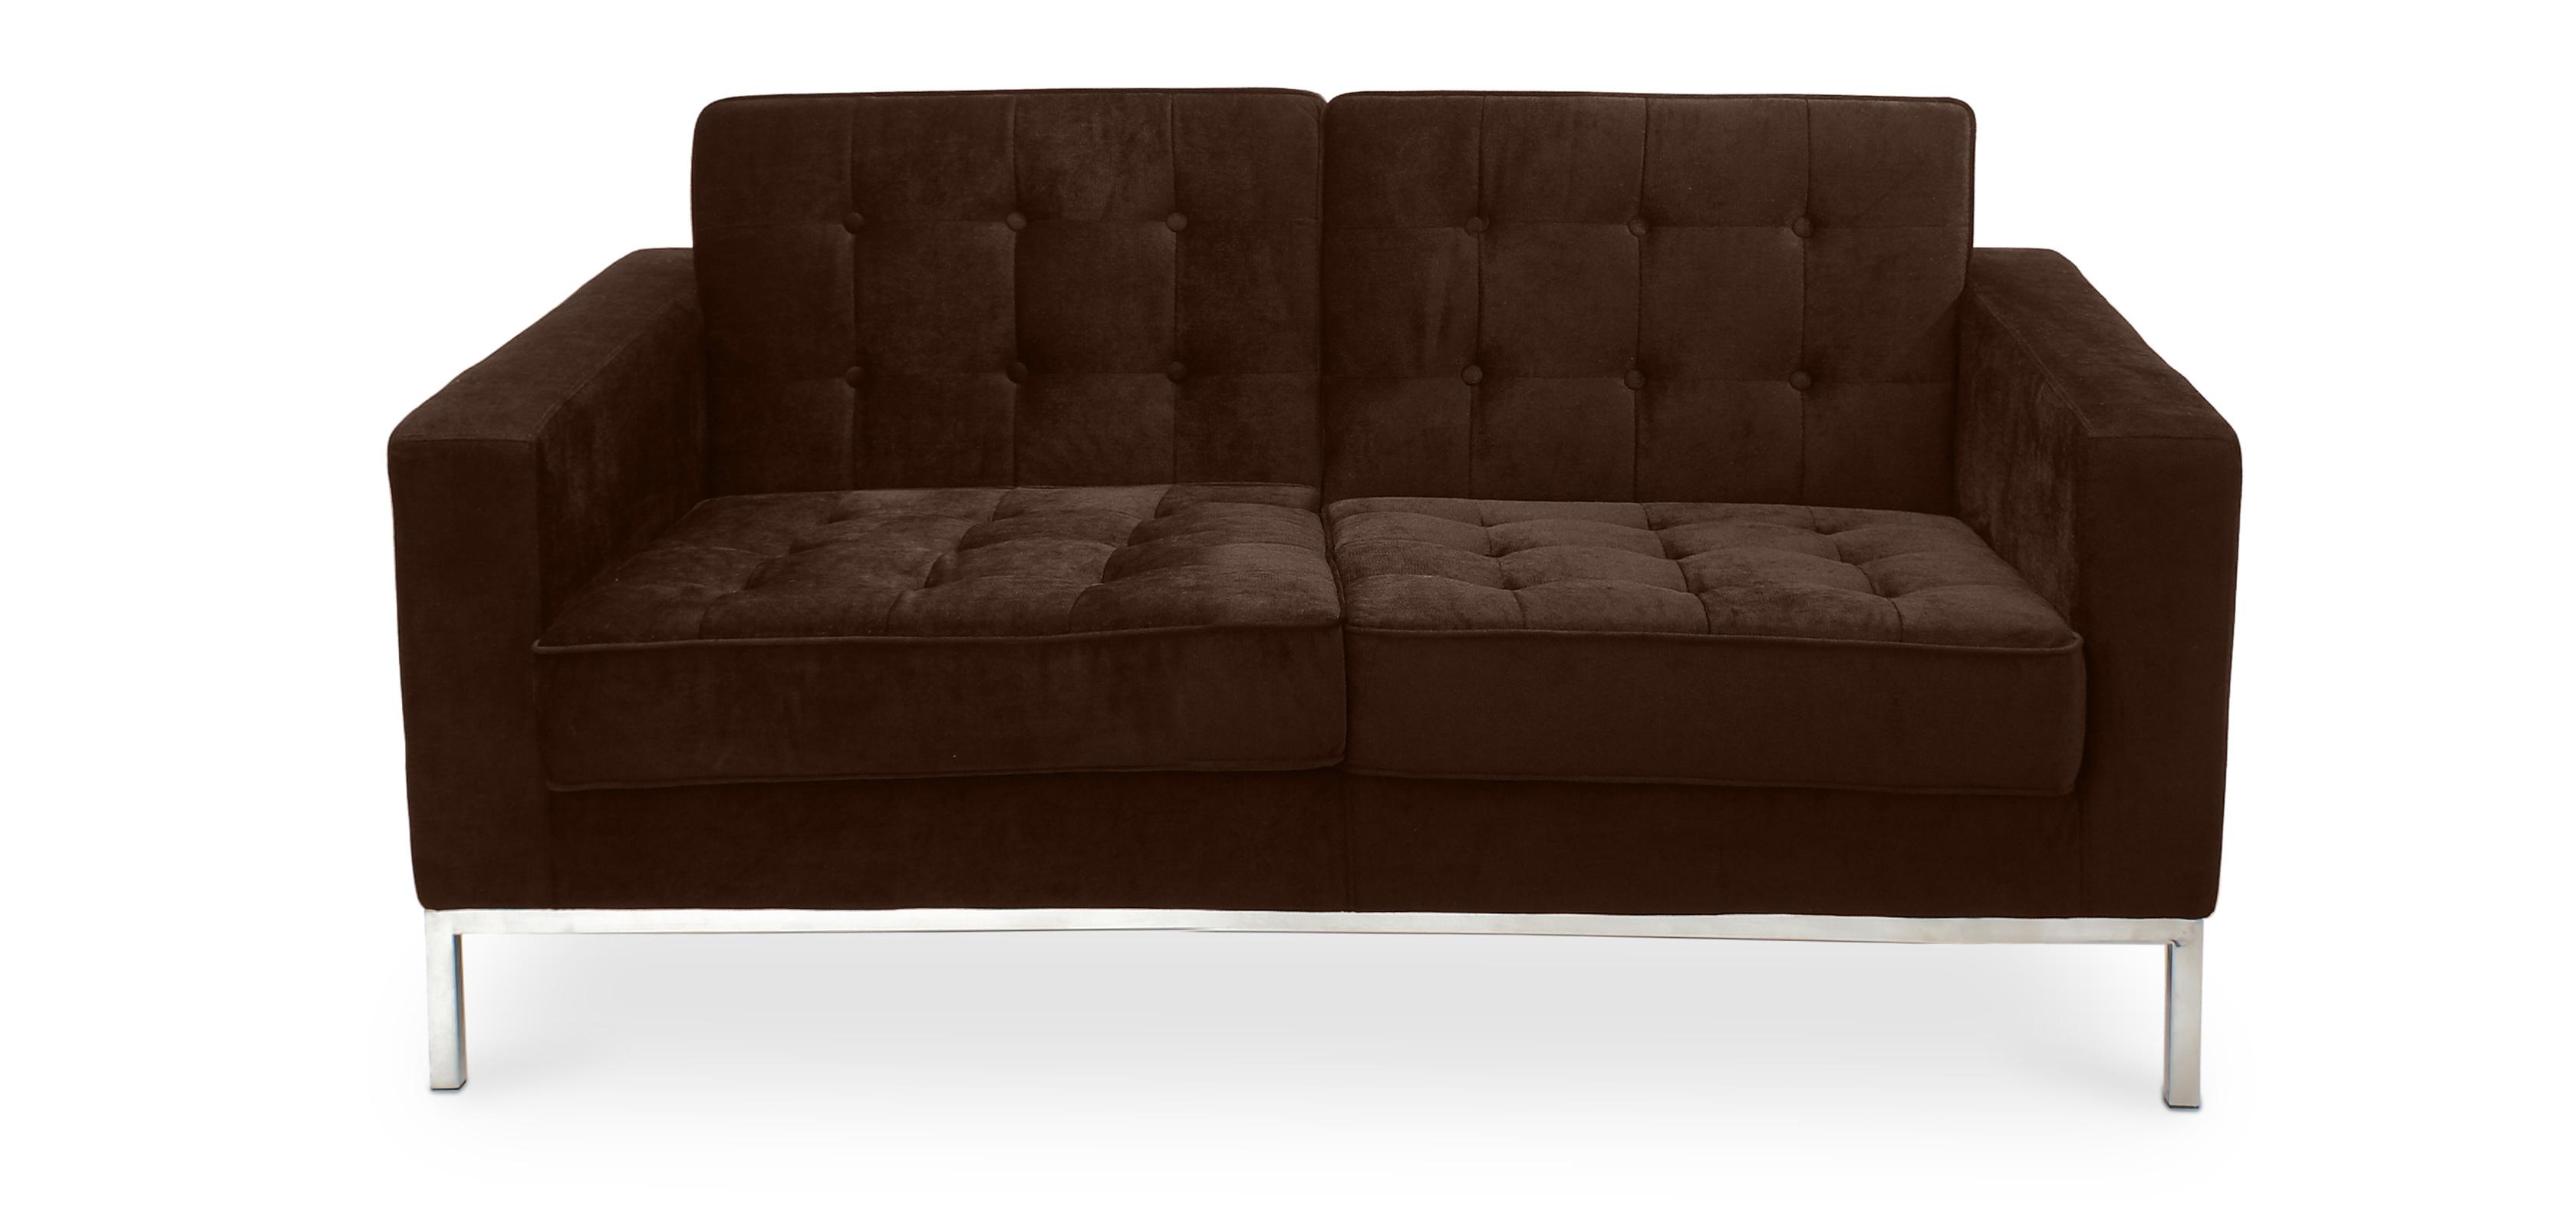 Zweisitzer sofa kanel stoff for Zweisitzer sofa